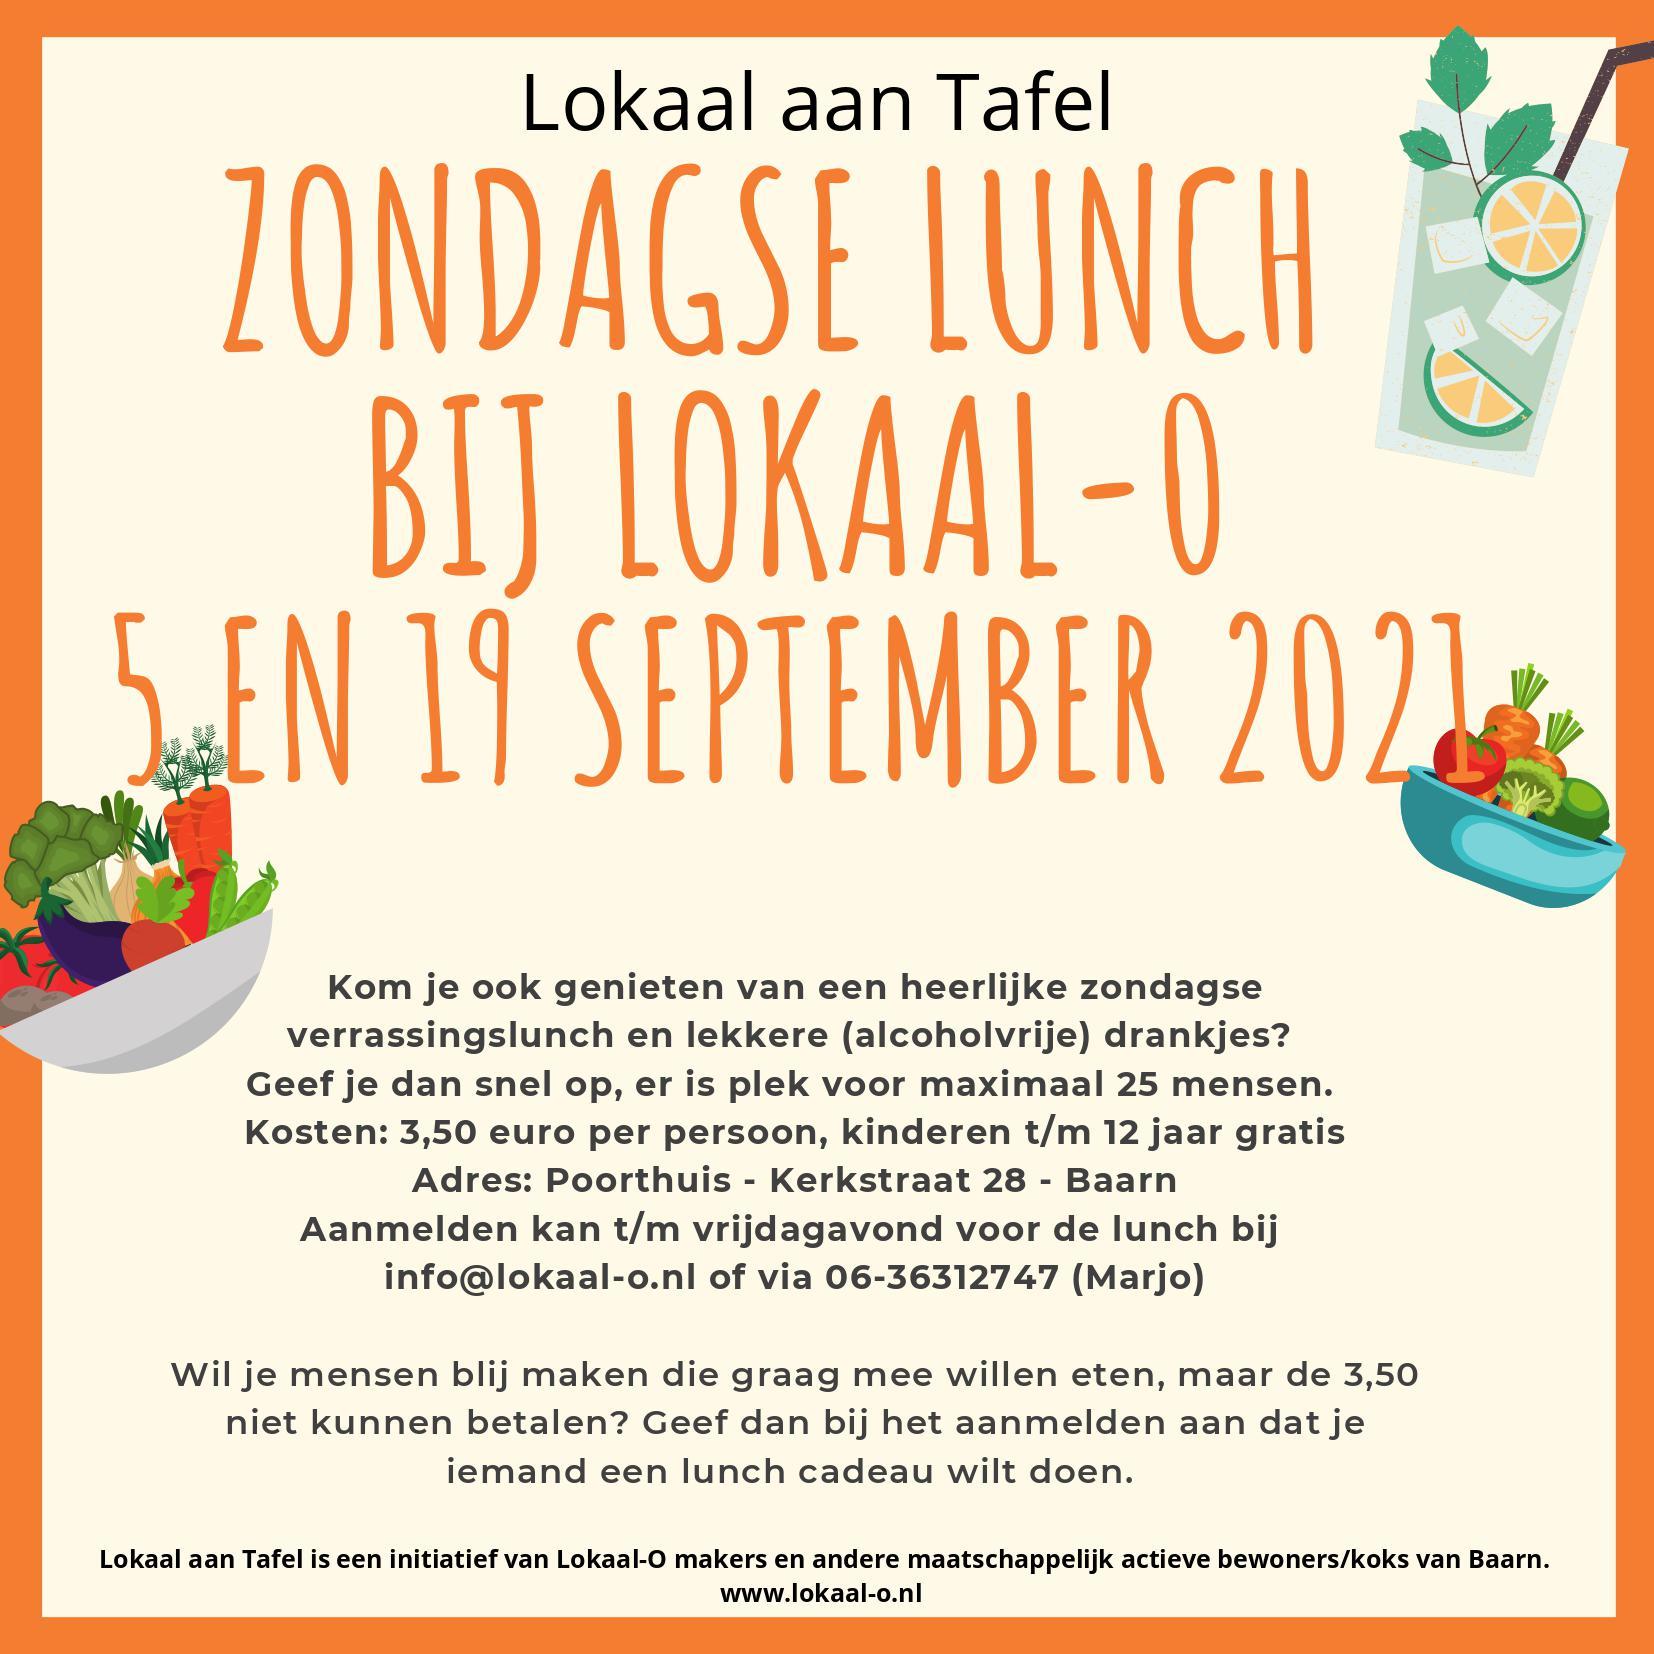 Lees meer over het artikel Lokaal aan Tafel: zondagse lunch op 19 september